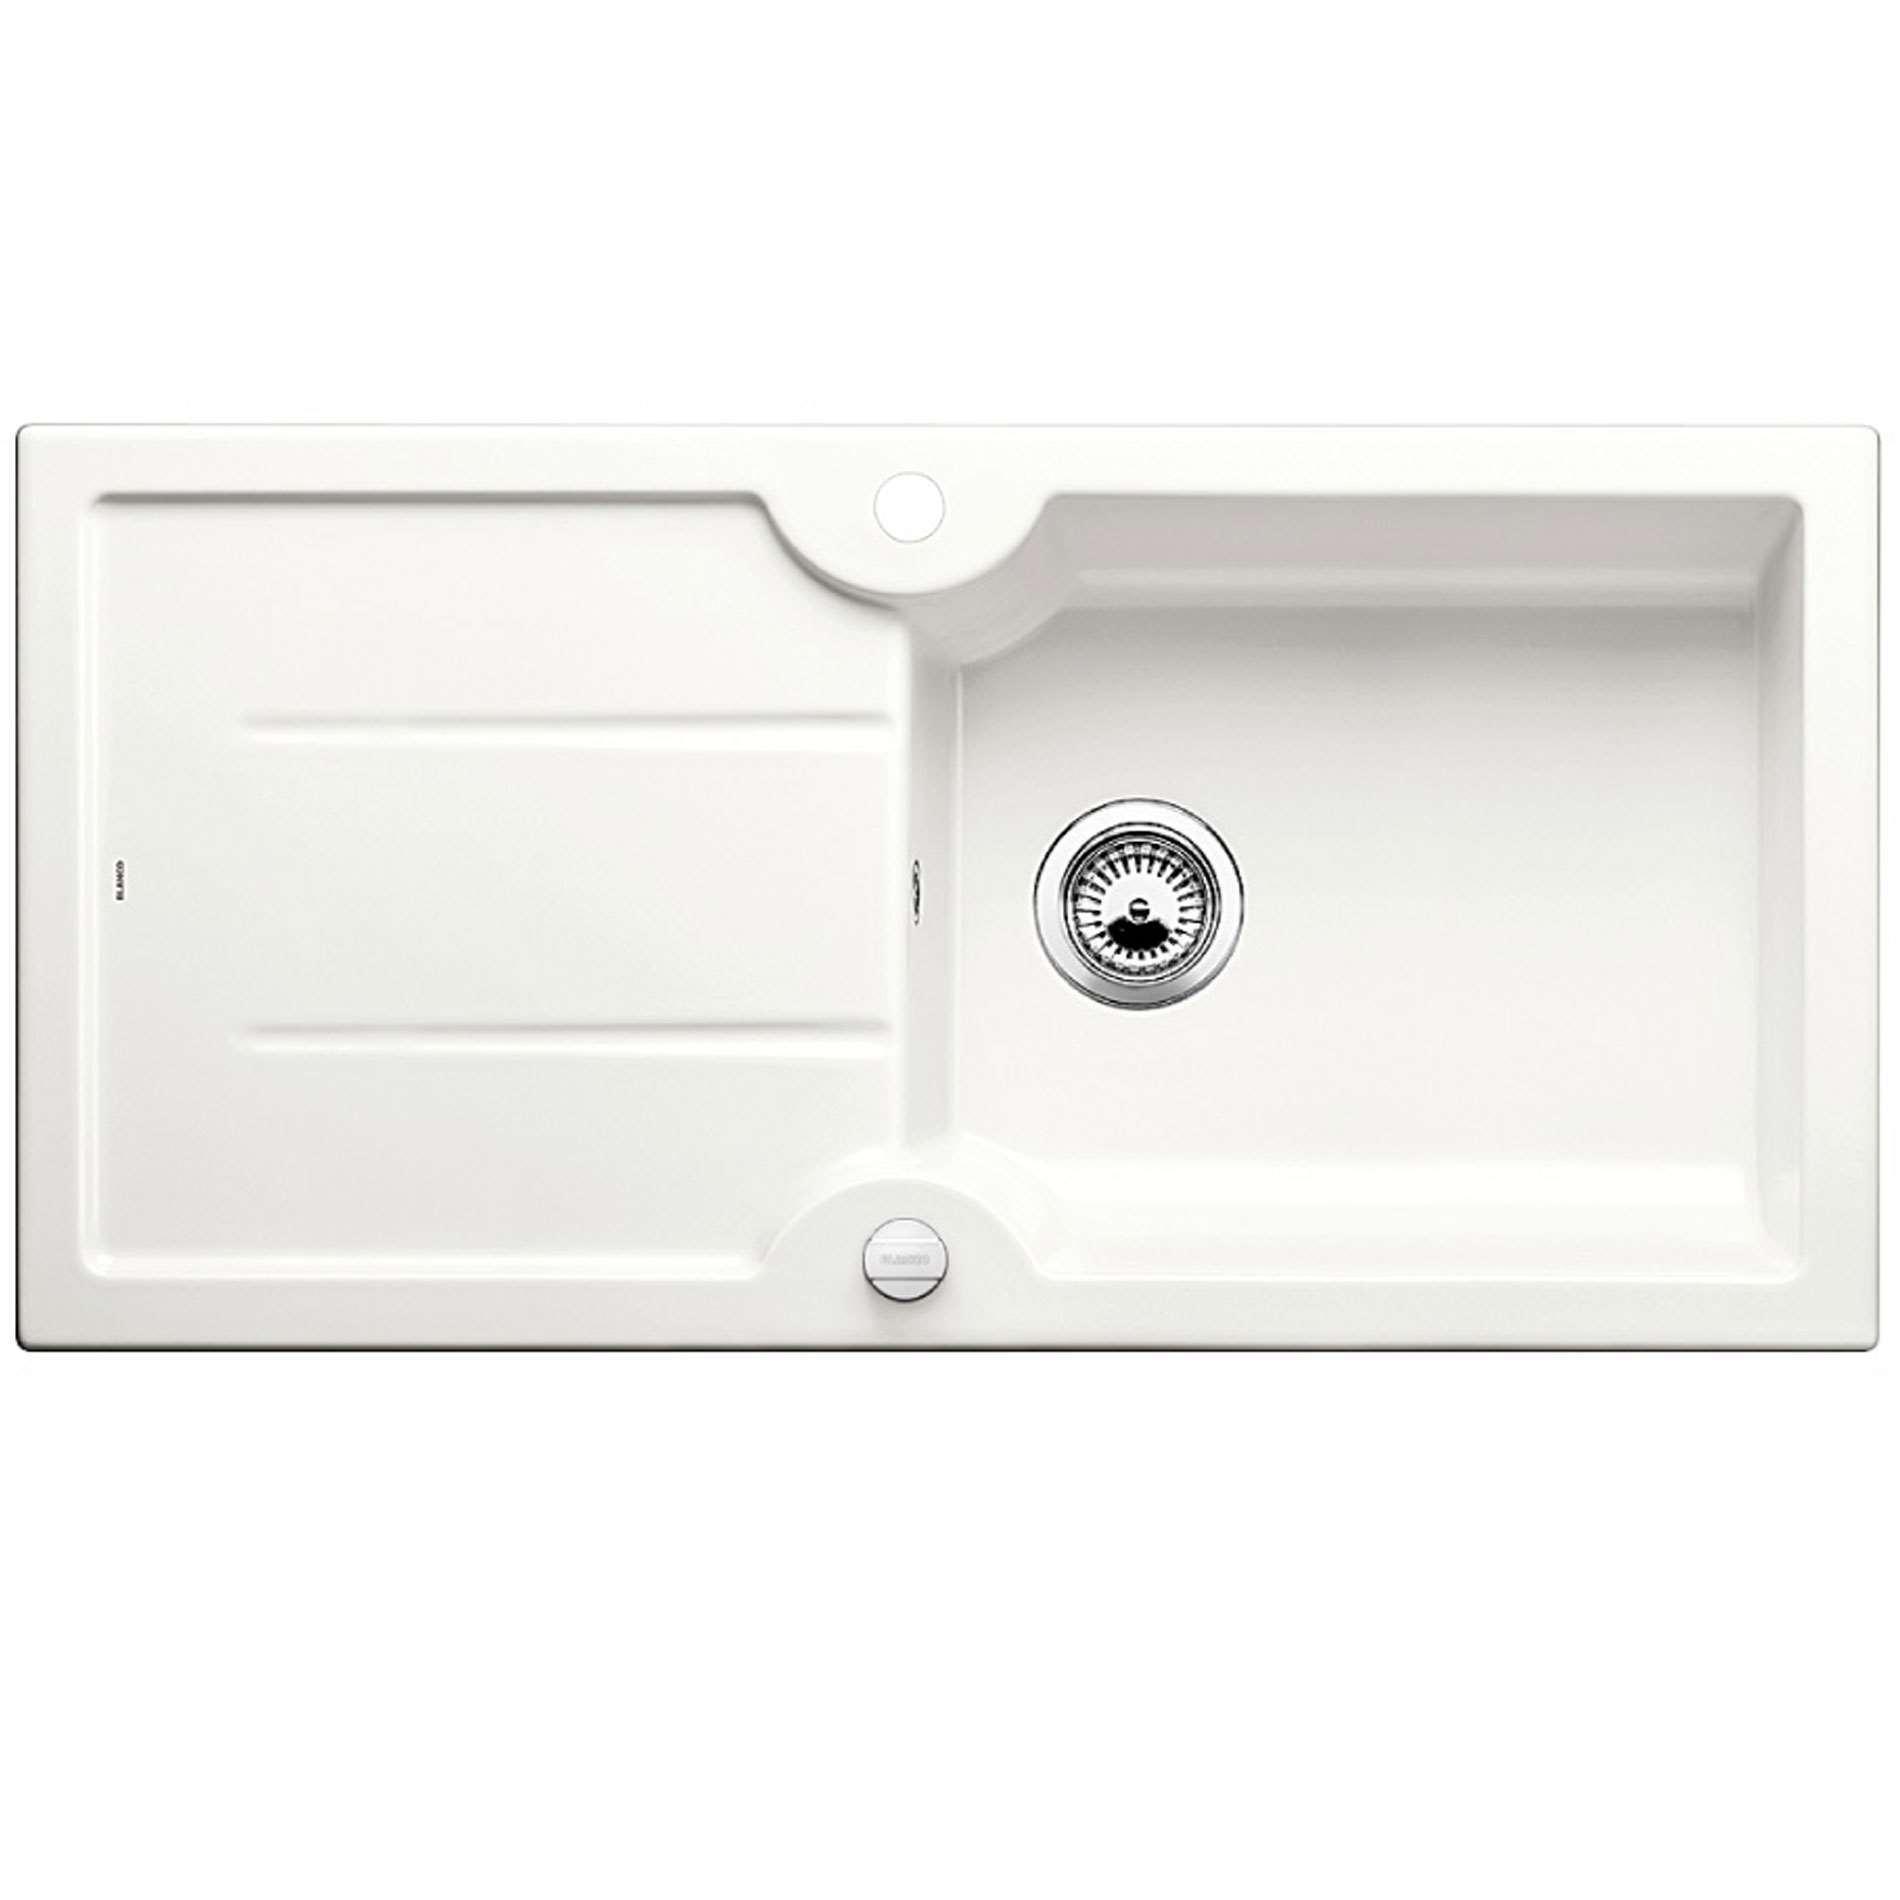 Blanco Idessa Xl 6 S Crystal White Ceramic Sink Kitchen